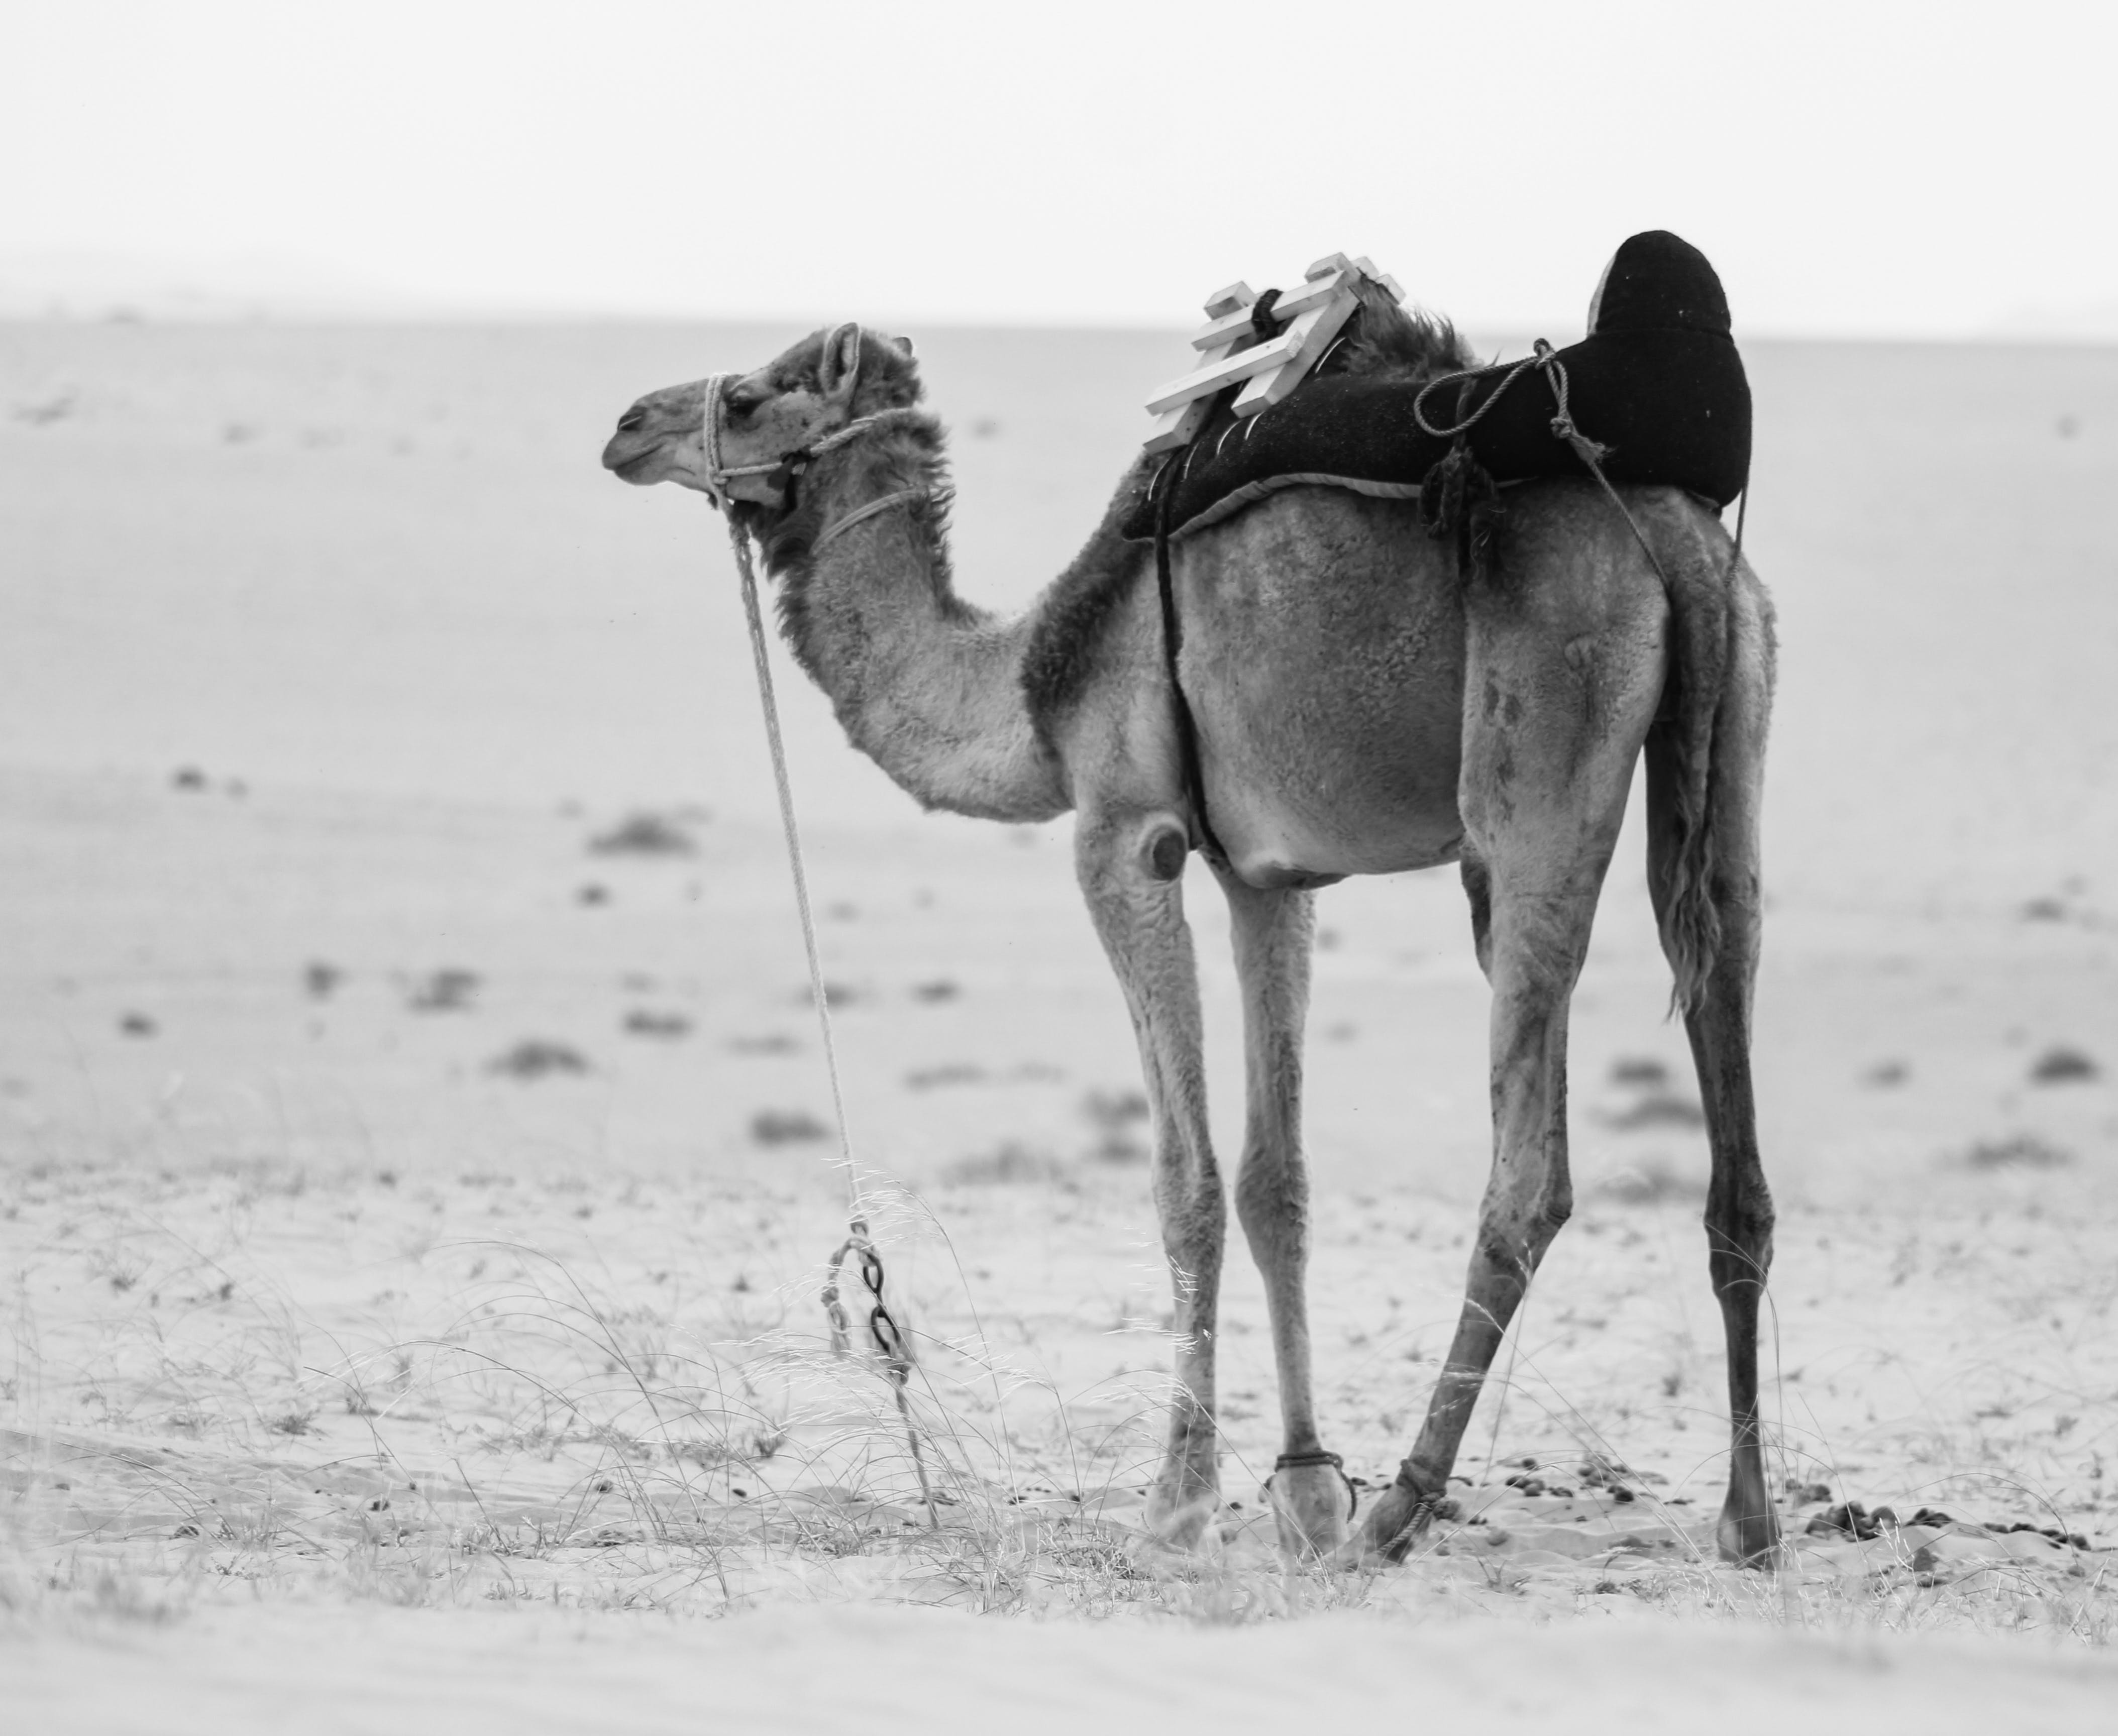 Monochrome Photo of Camel